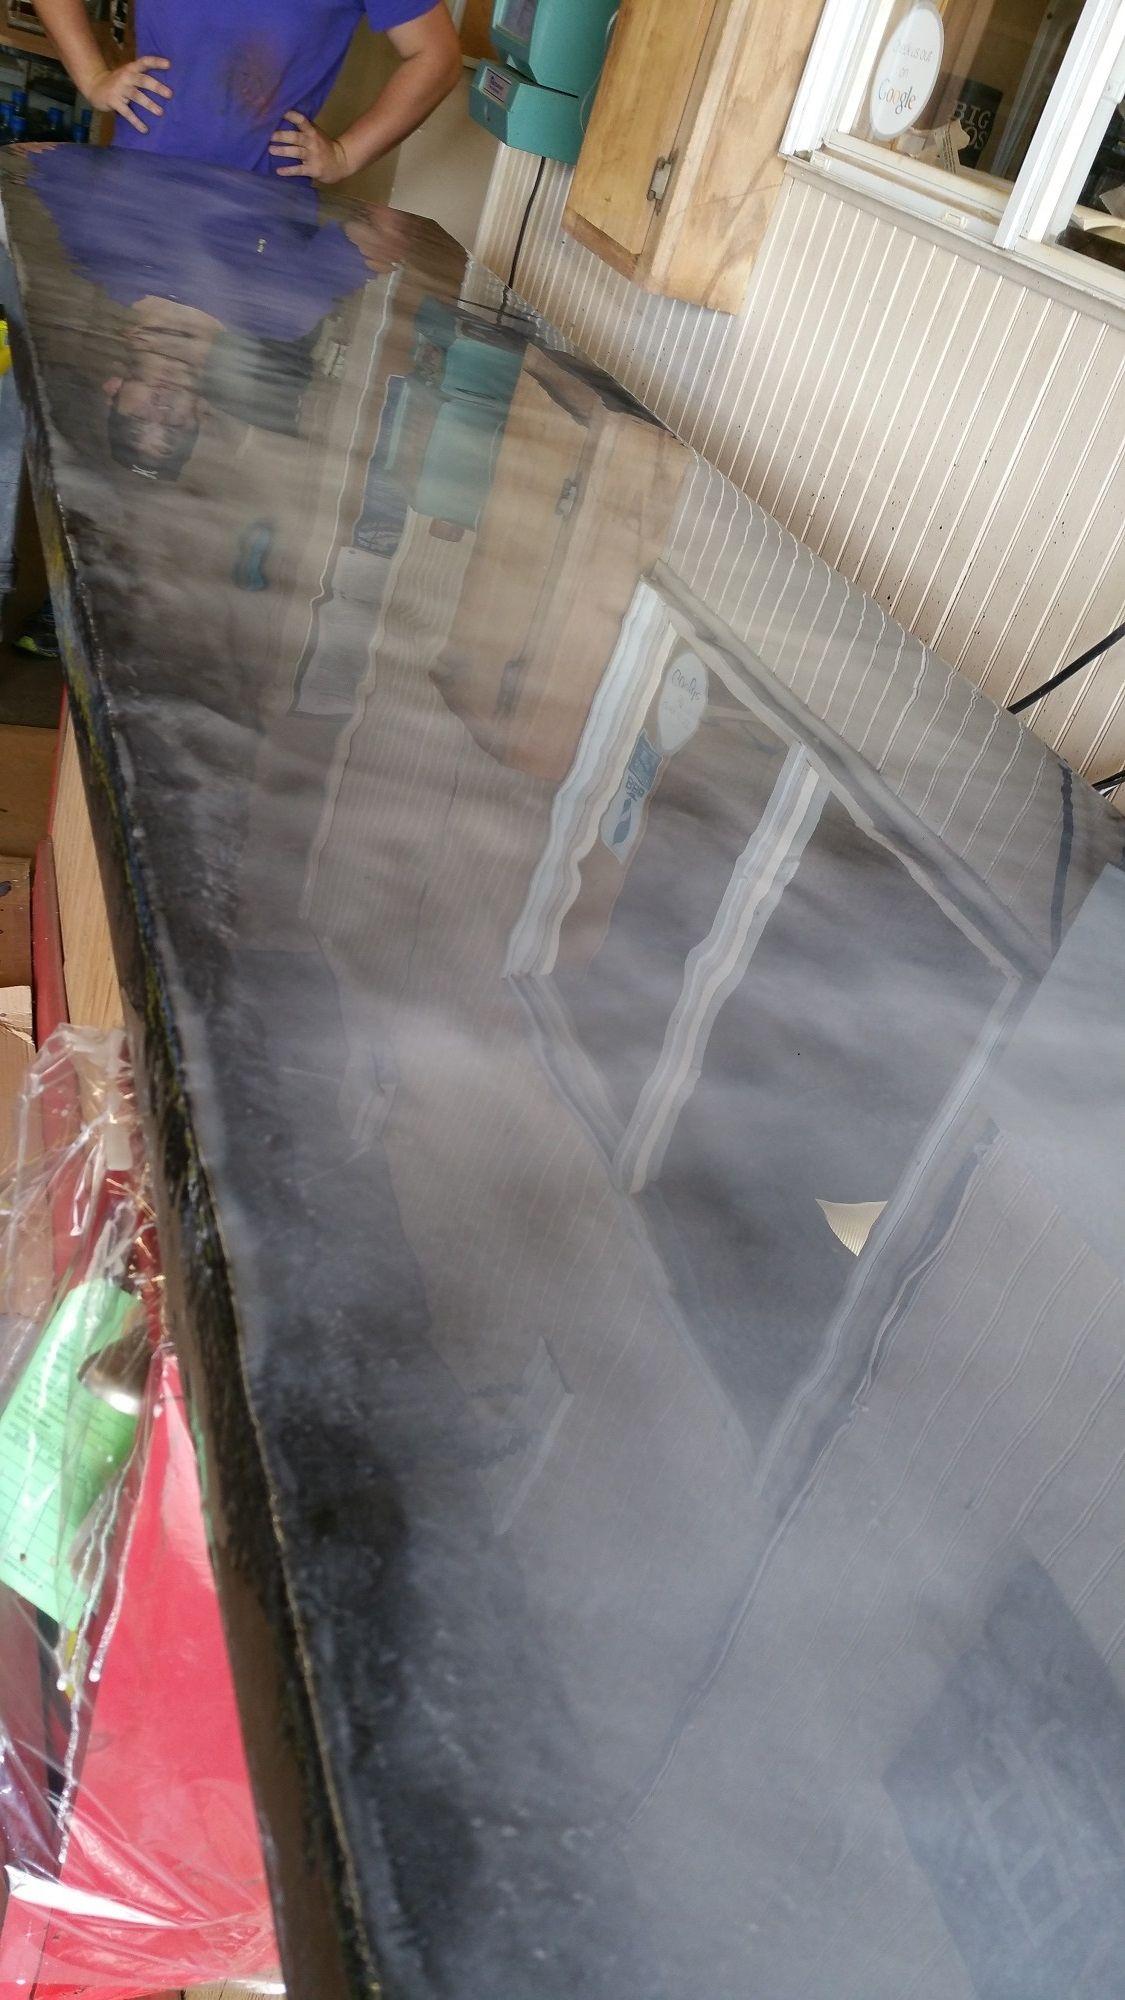 Metallic Epoxy Countertop Kit Diy Countertops Epoxy Countertop